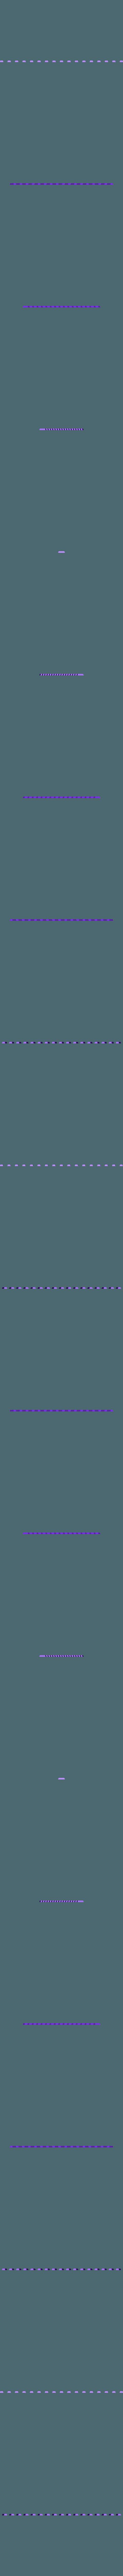 bracelet_beads_1-2.STL Download free STL file Multi-Color Bangle (Bracelet) • 3D printer template, MosaicManufacturing